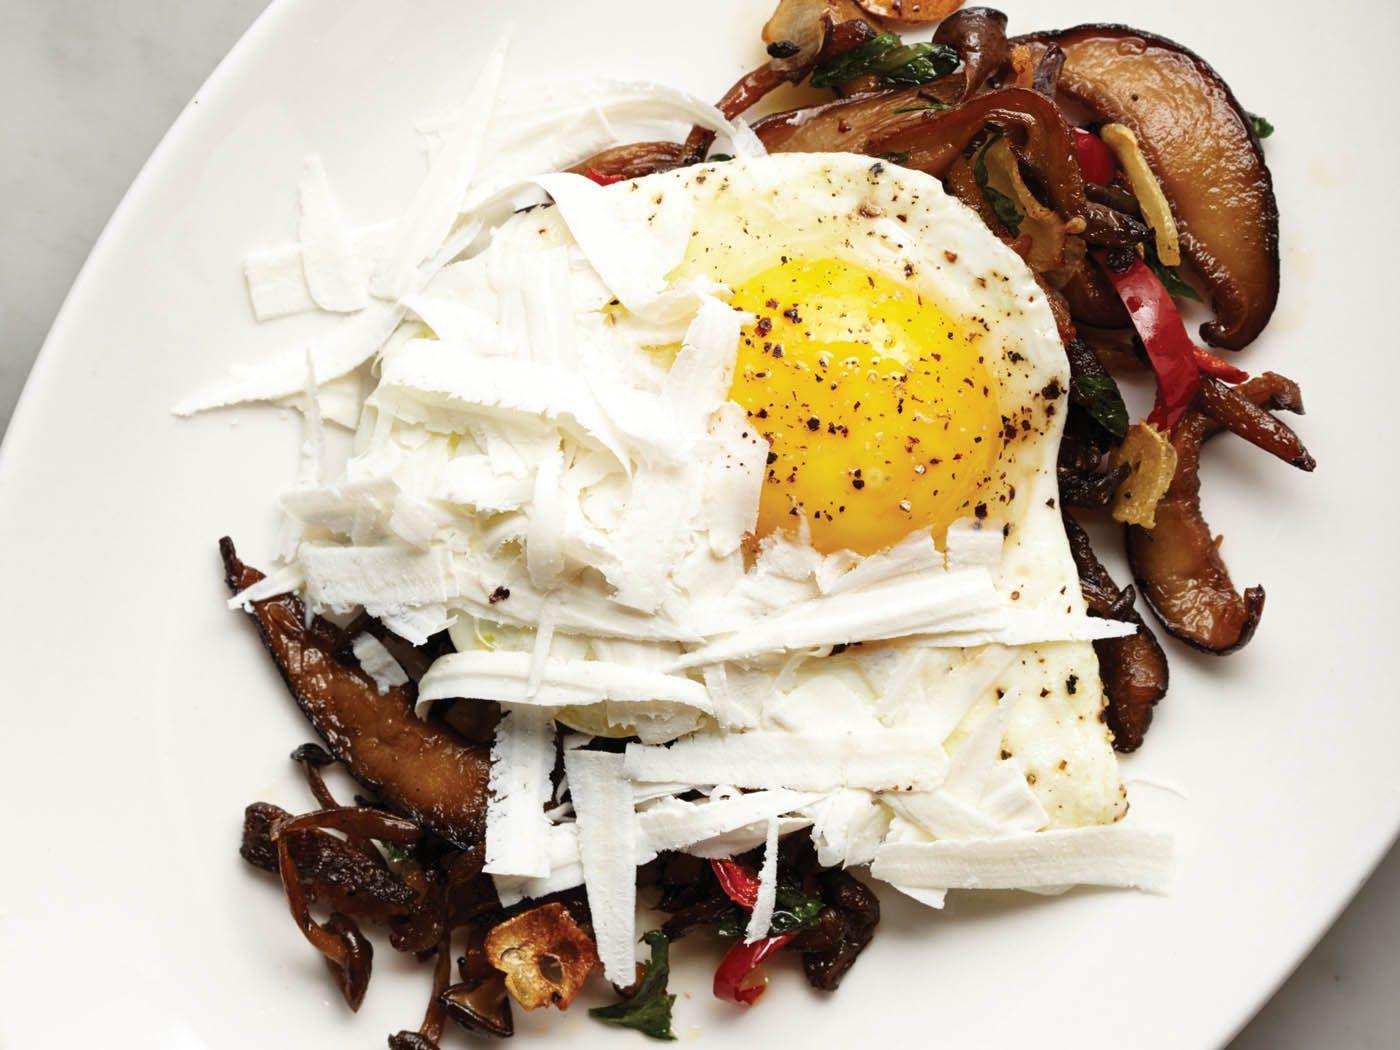 20141029-downtown-italian-roasted-mushrooms-with-bacon-and-eggs-tara-donne.jpg